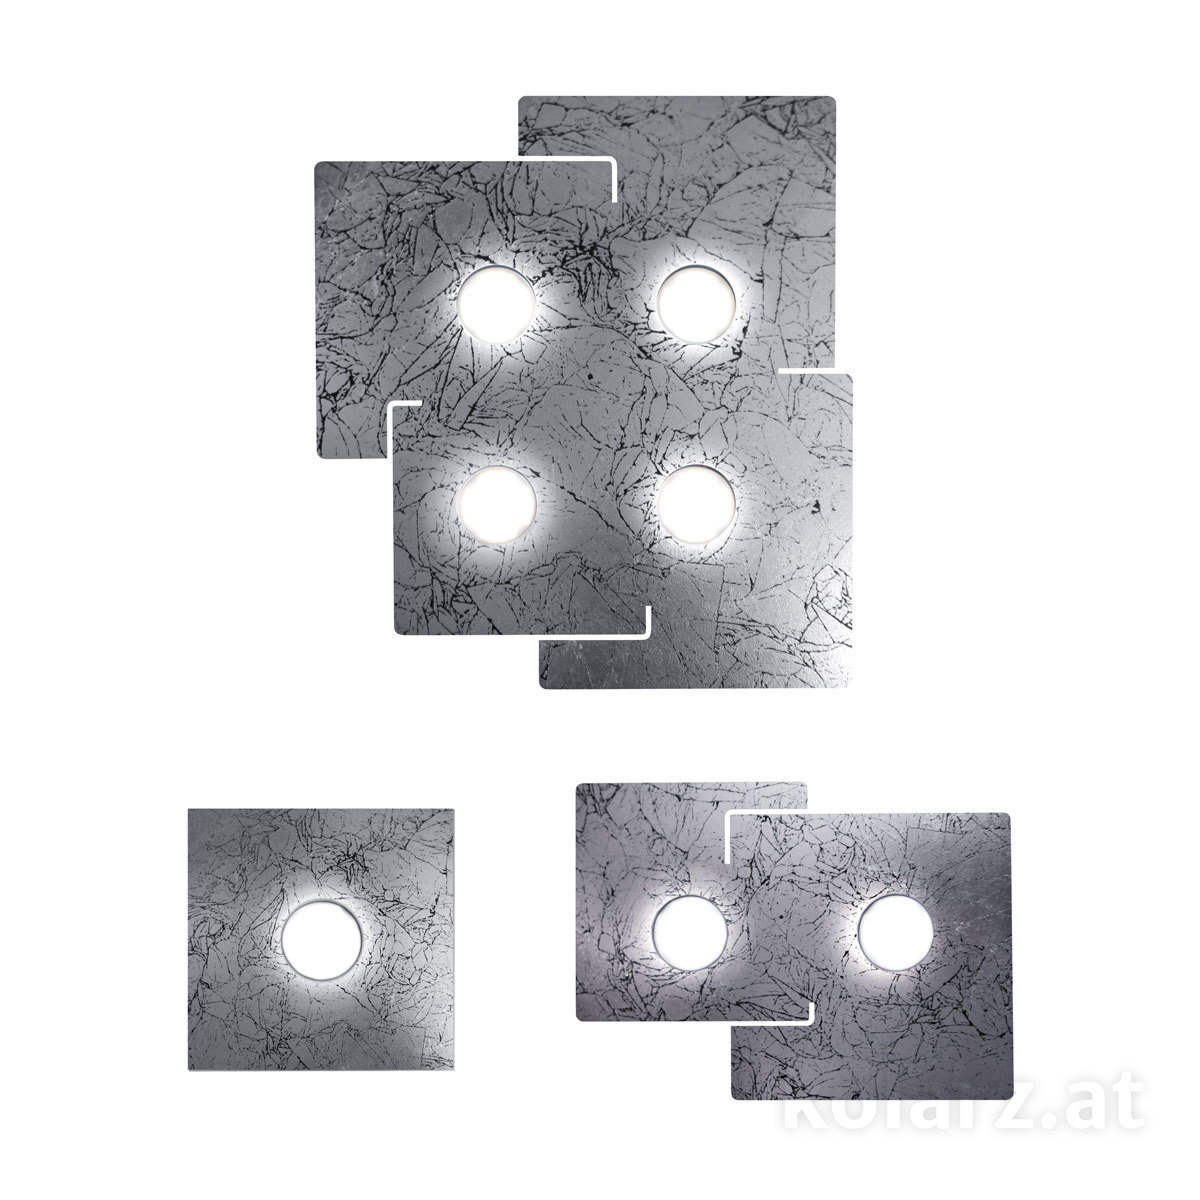 A1337-11-1-VinAg-f2.jpg